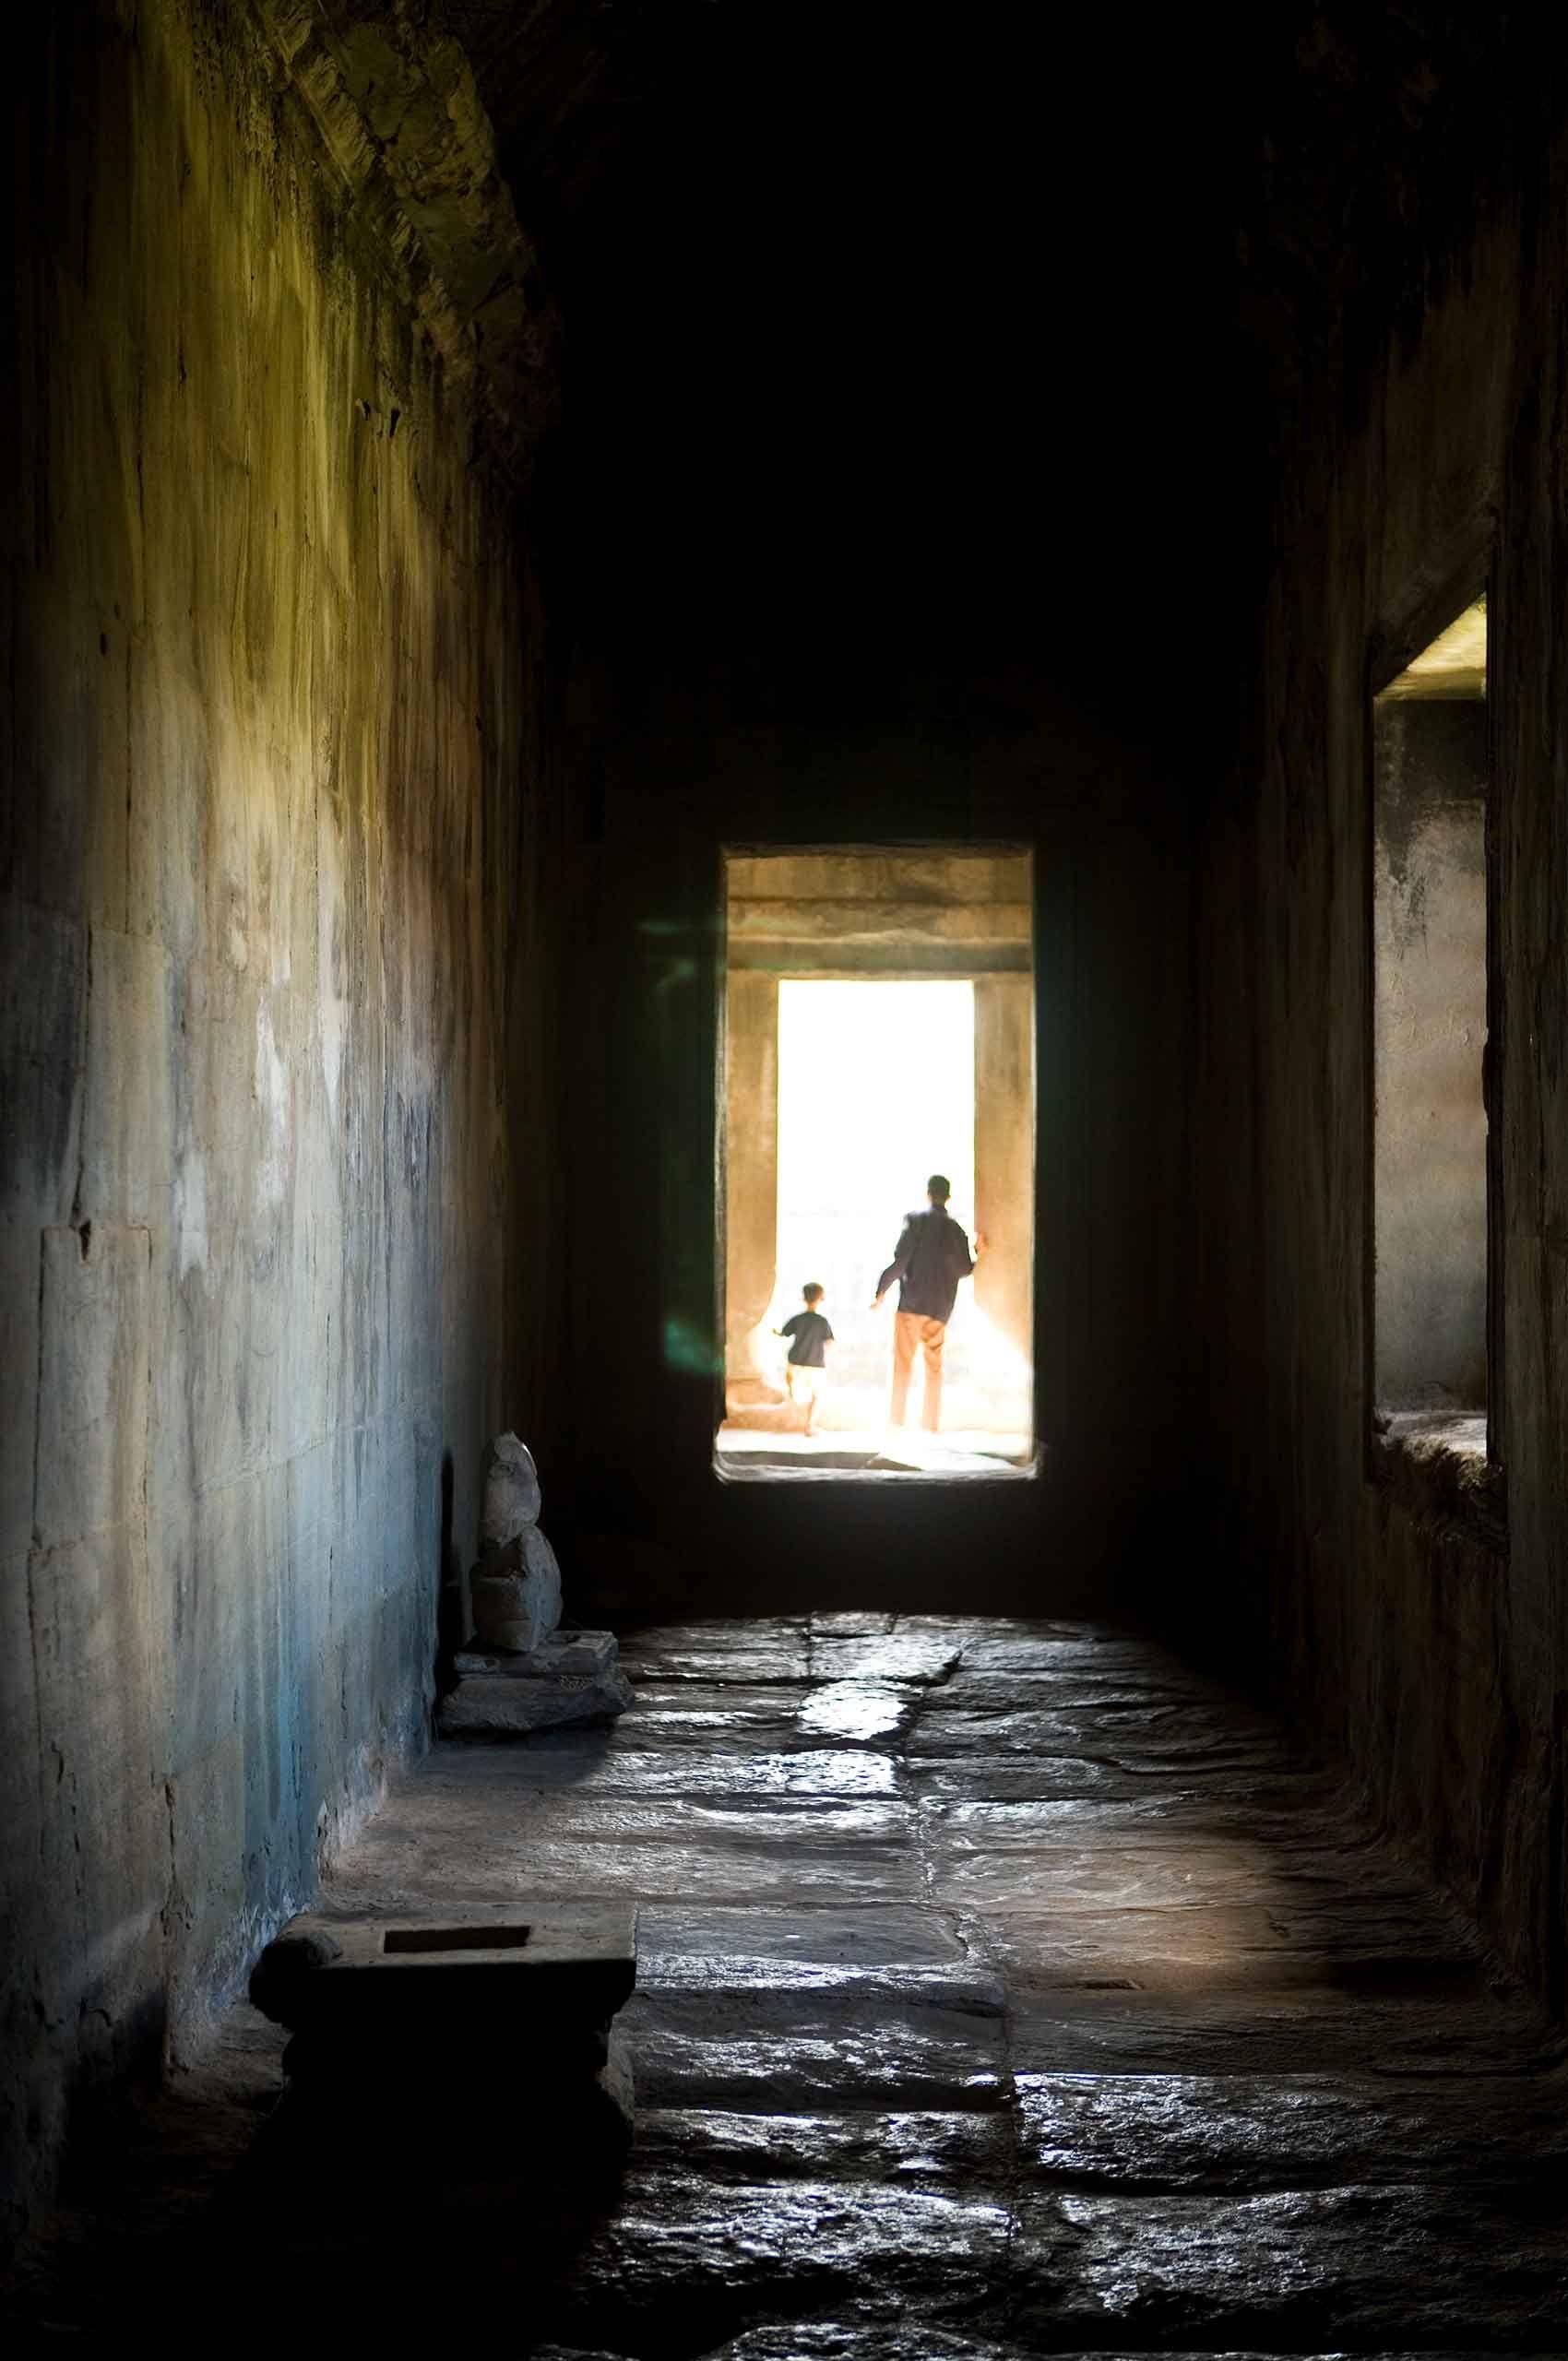 passgaeway-angkorwat-cambodia-by-henrikolundphotography.jpg